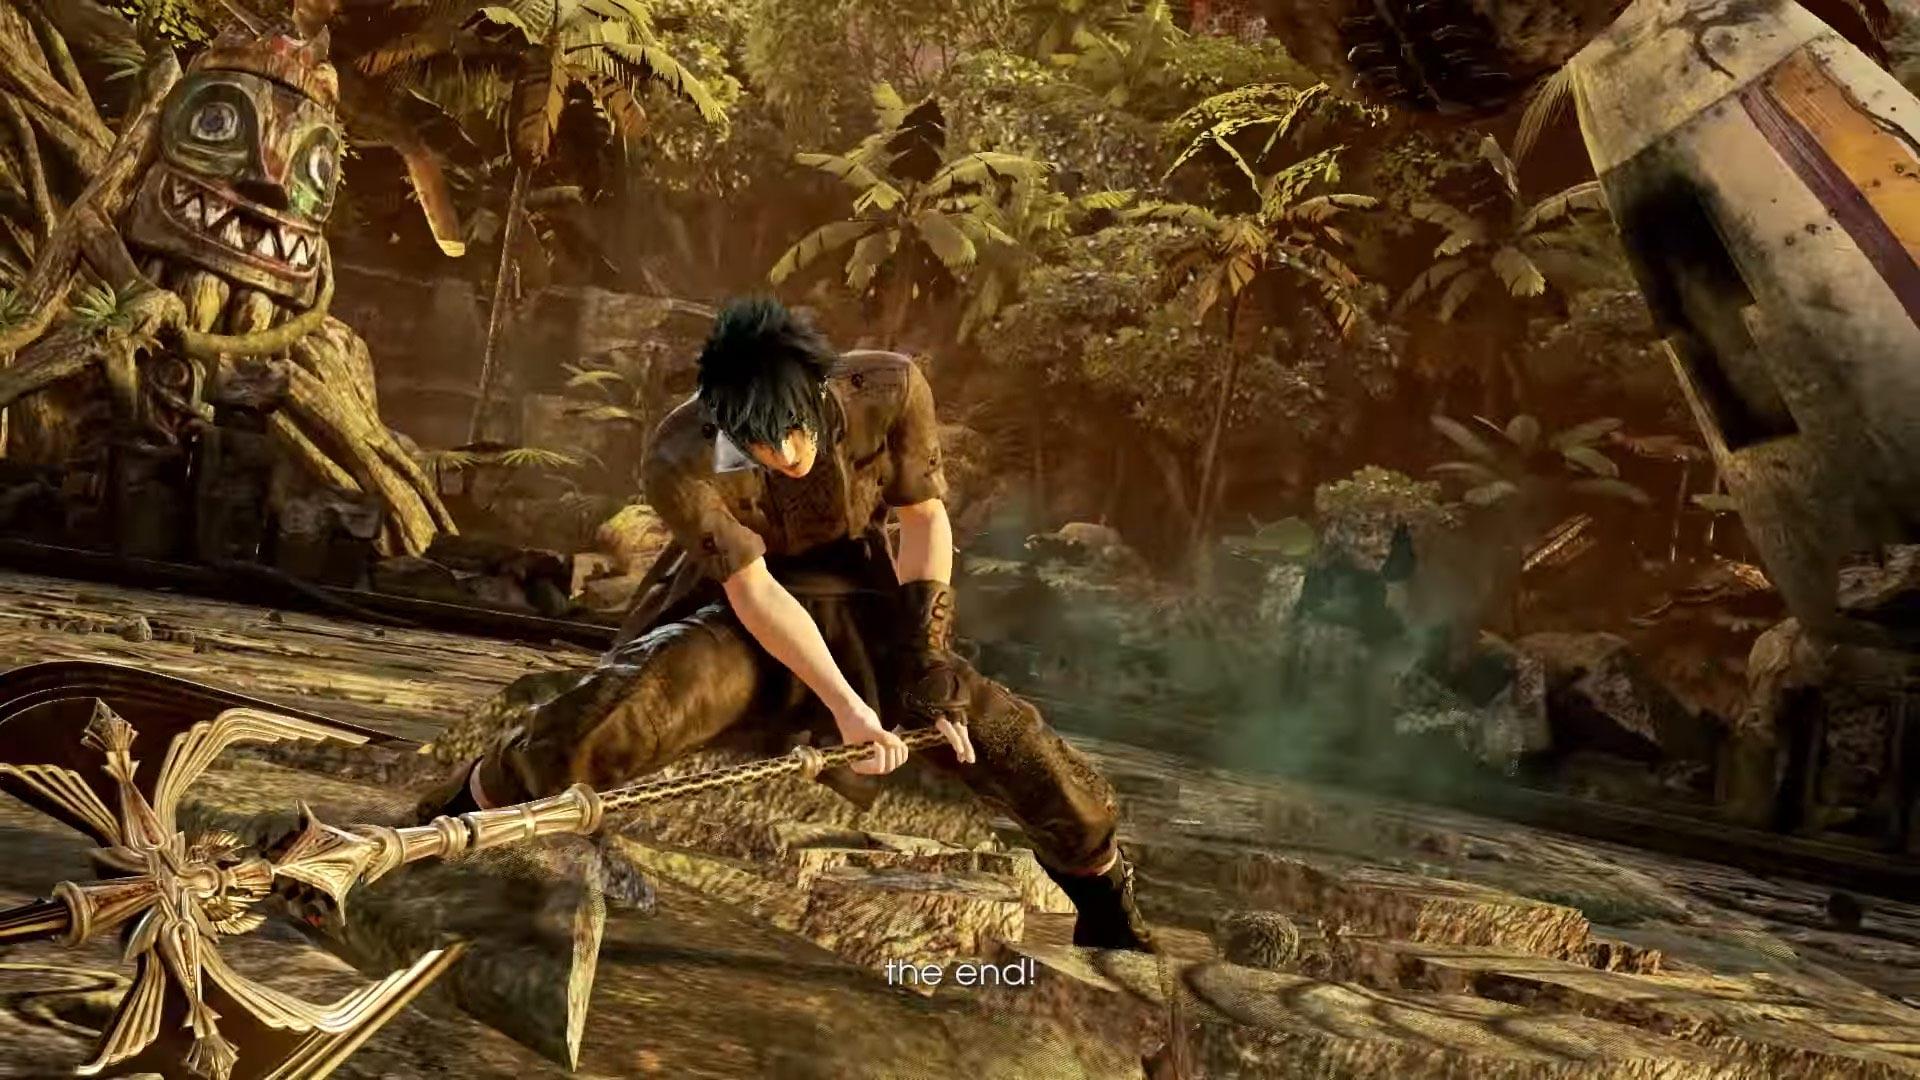 Tekken 7 Noctis Lucis Caelum Reveal Screenshots 8 out of 9 image gallery